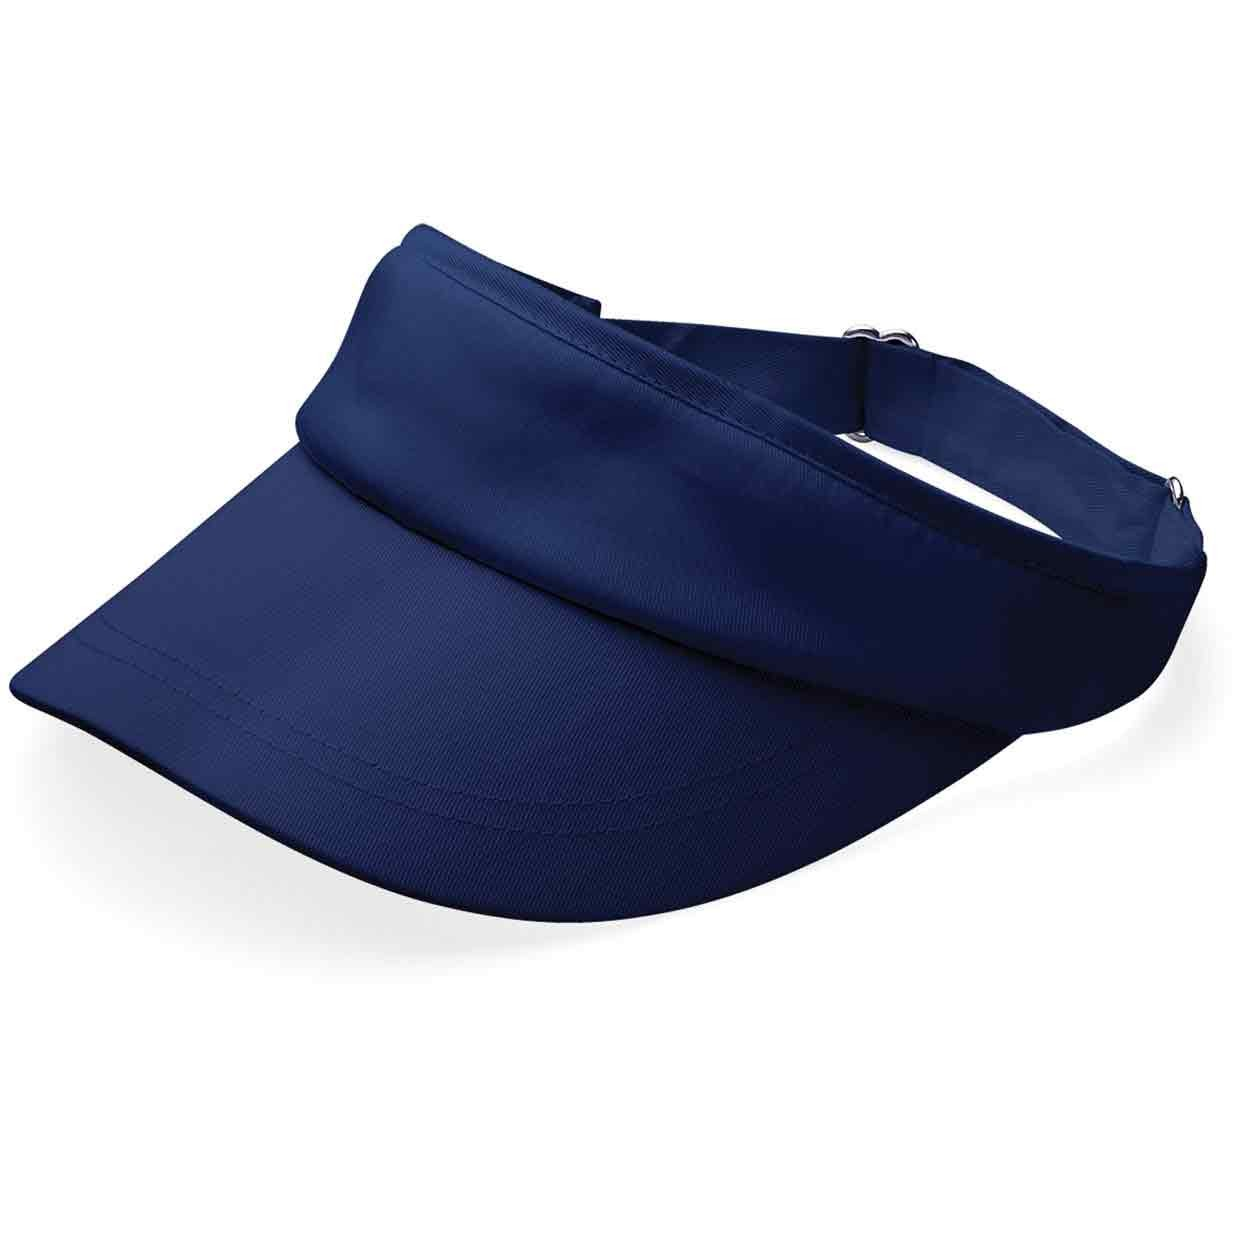 Beechfield BB41 Sun Visor - Baseball Caps - Hats   Caps ... fdc99157085